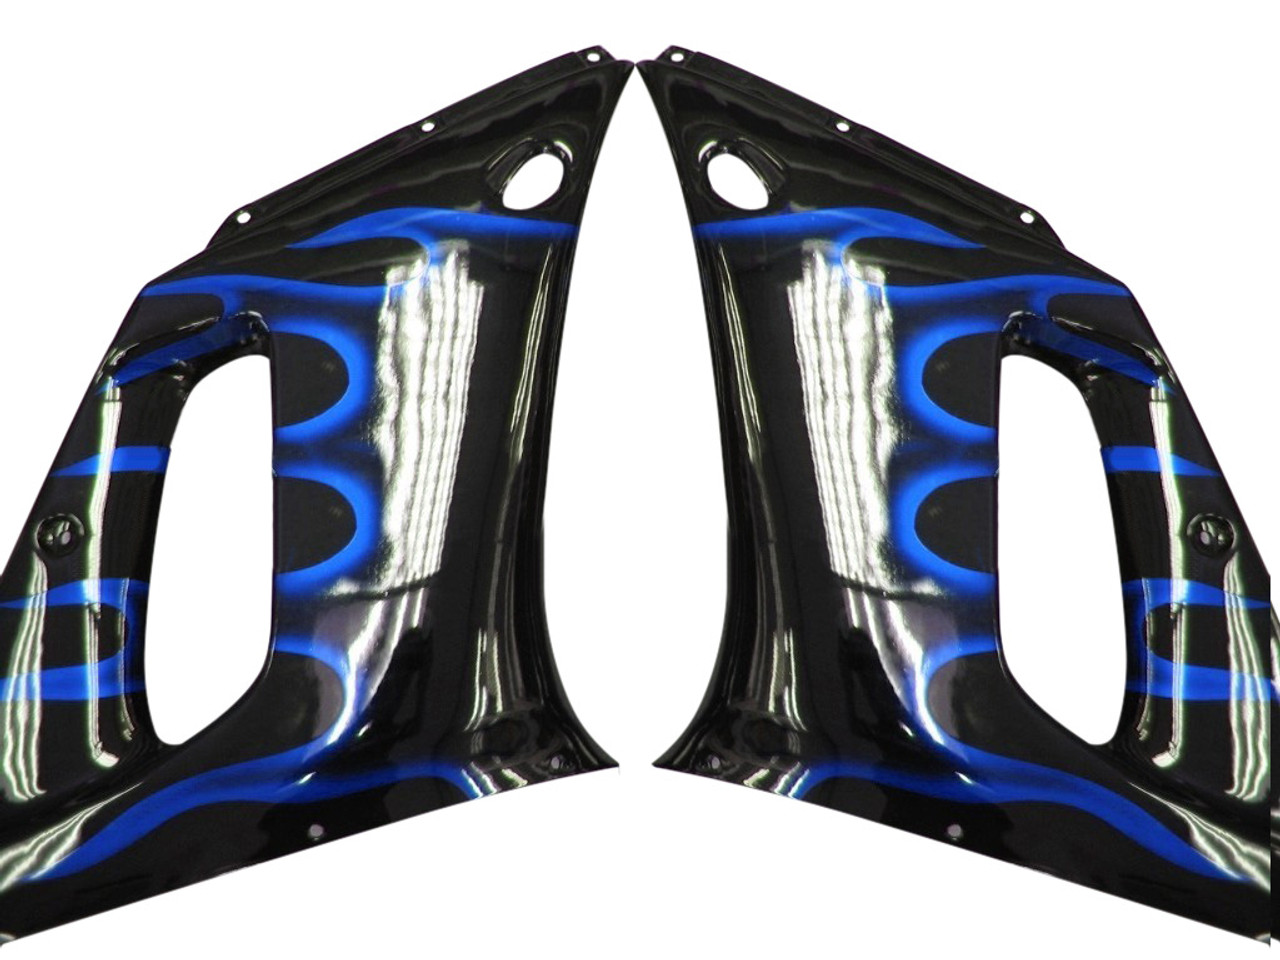 Fairings Yamaha YZF-R6 Black & Blue Flame R6 Racing (1998-2002)